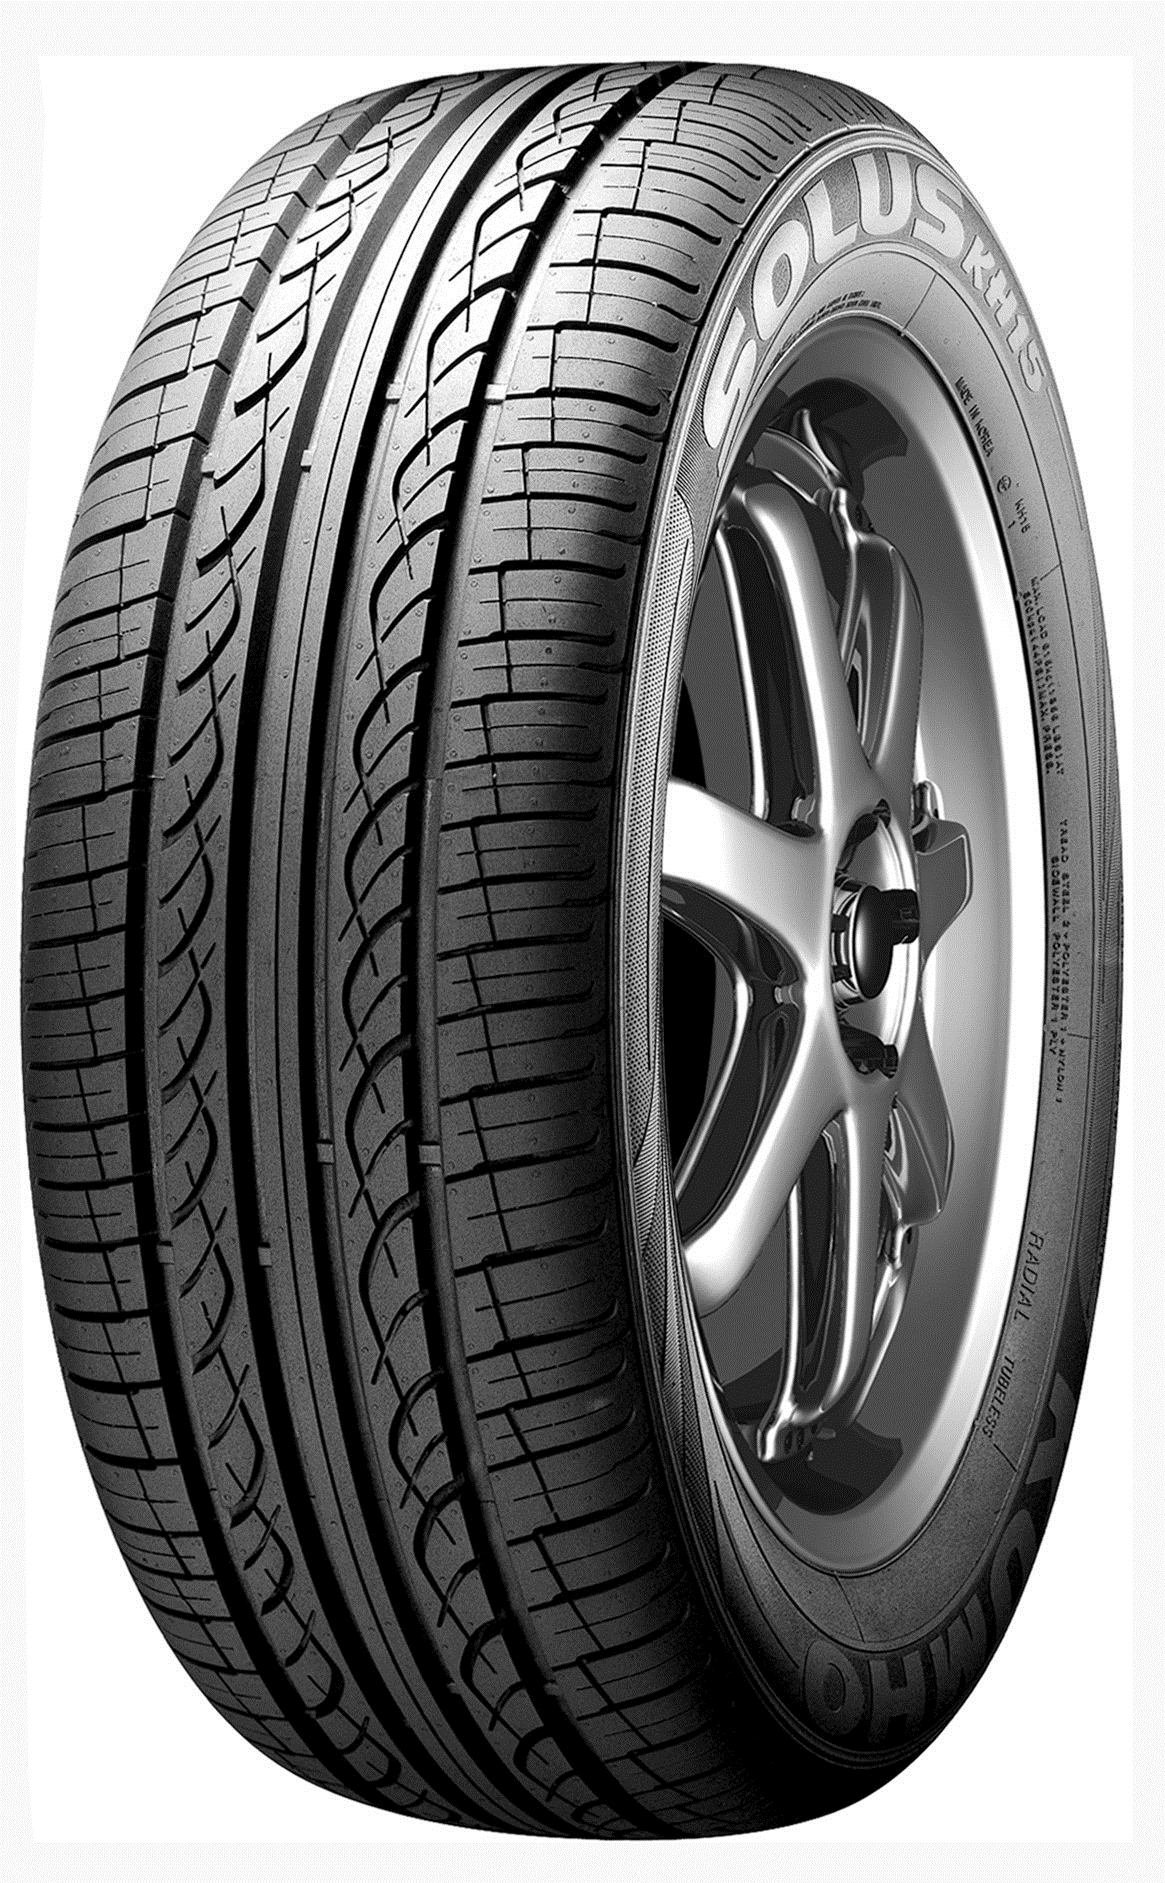 Neumático KUMHO KH15 235/60R17 102 H